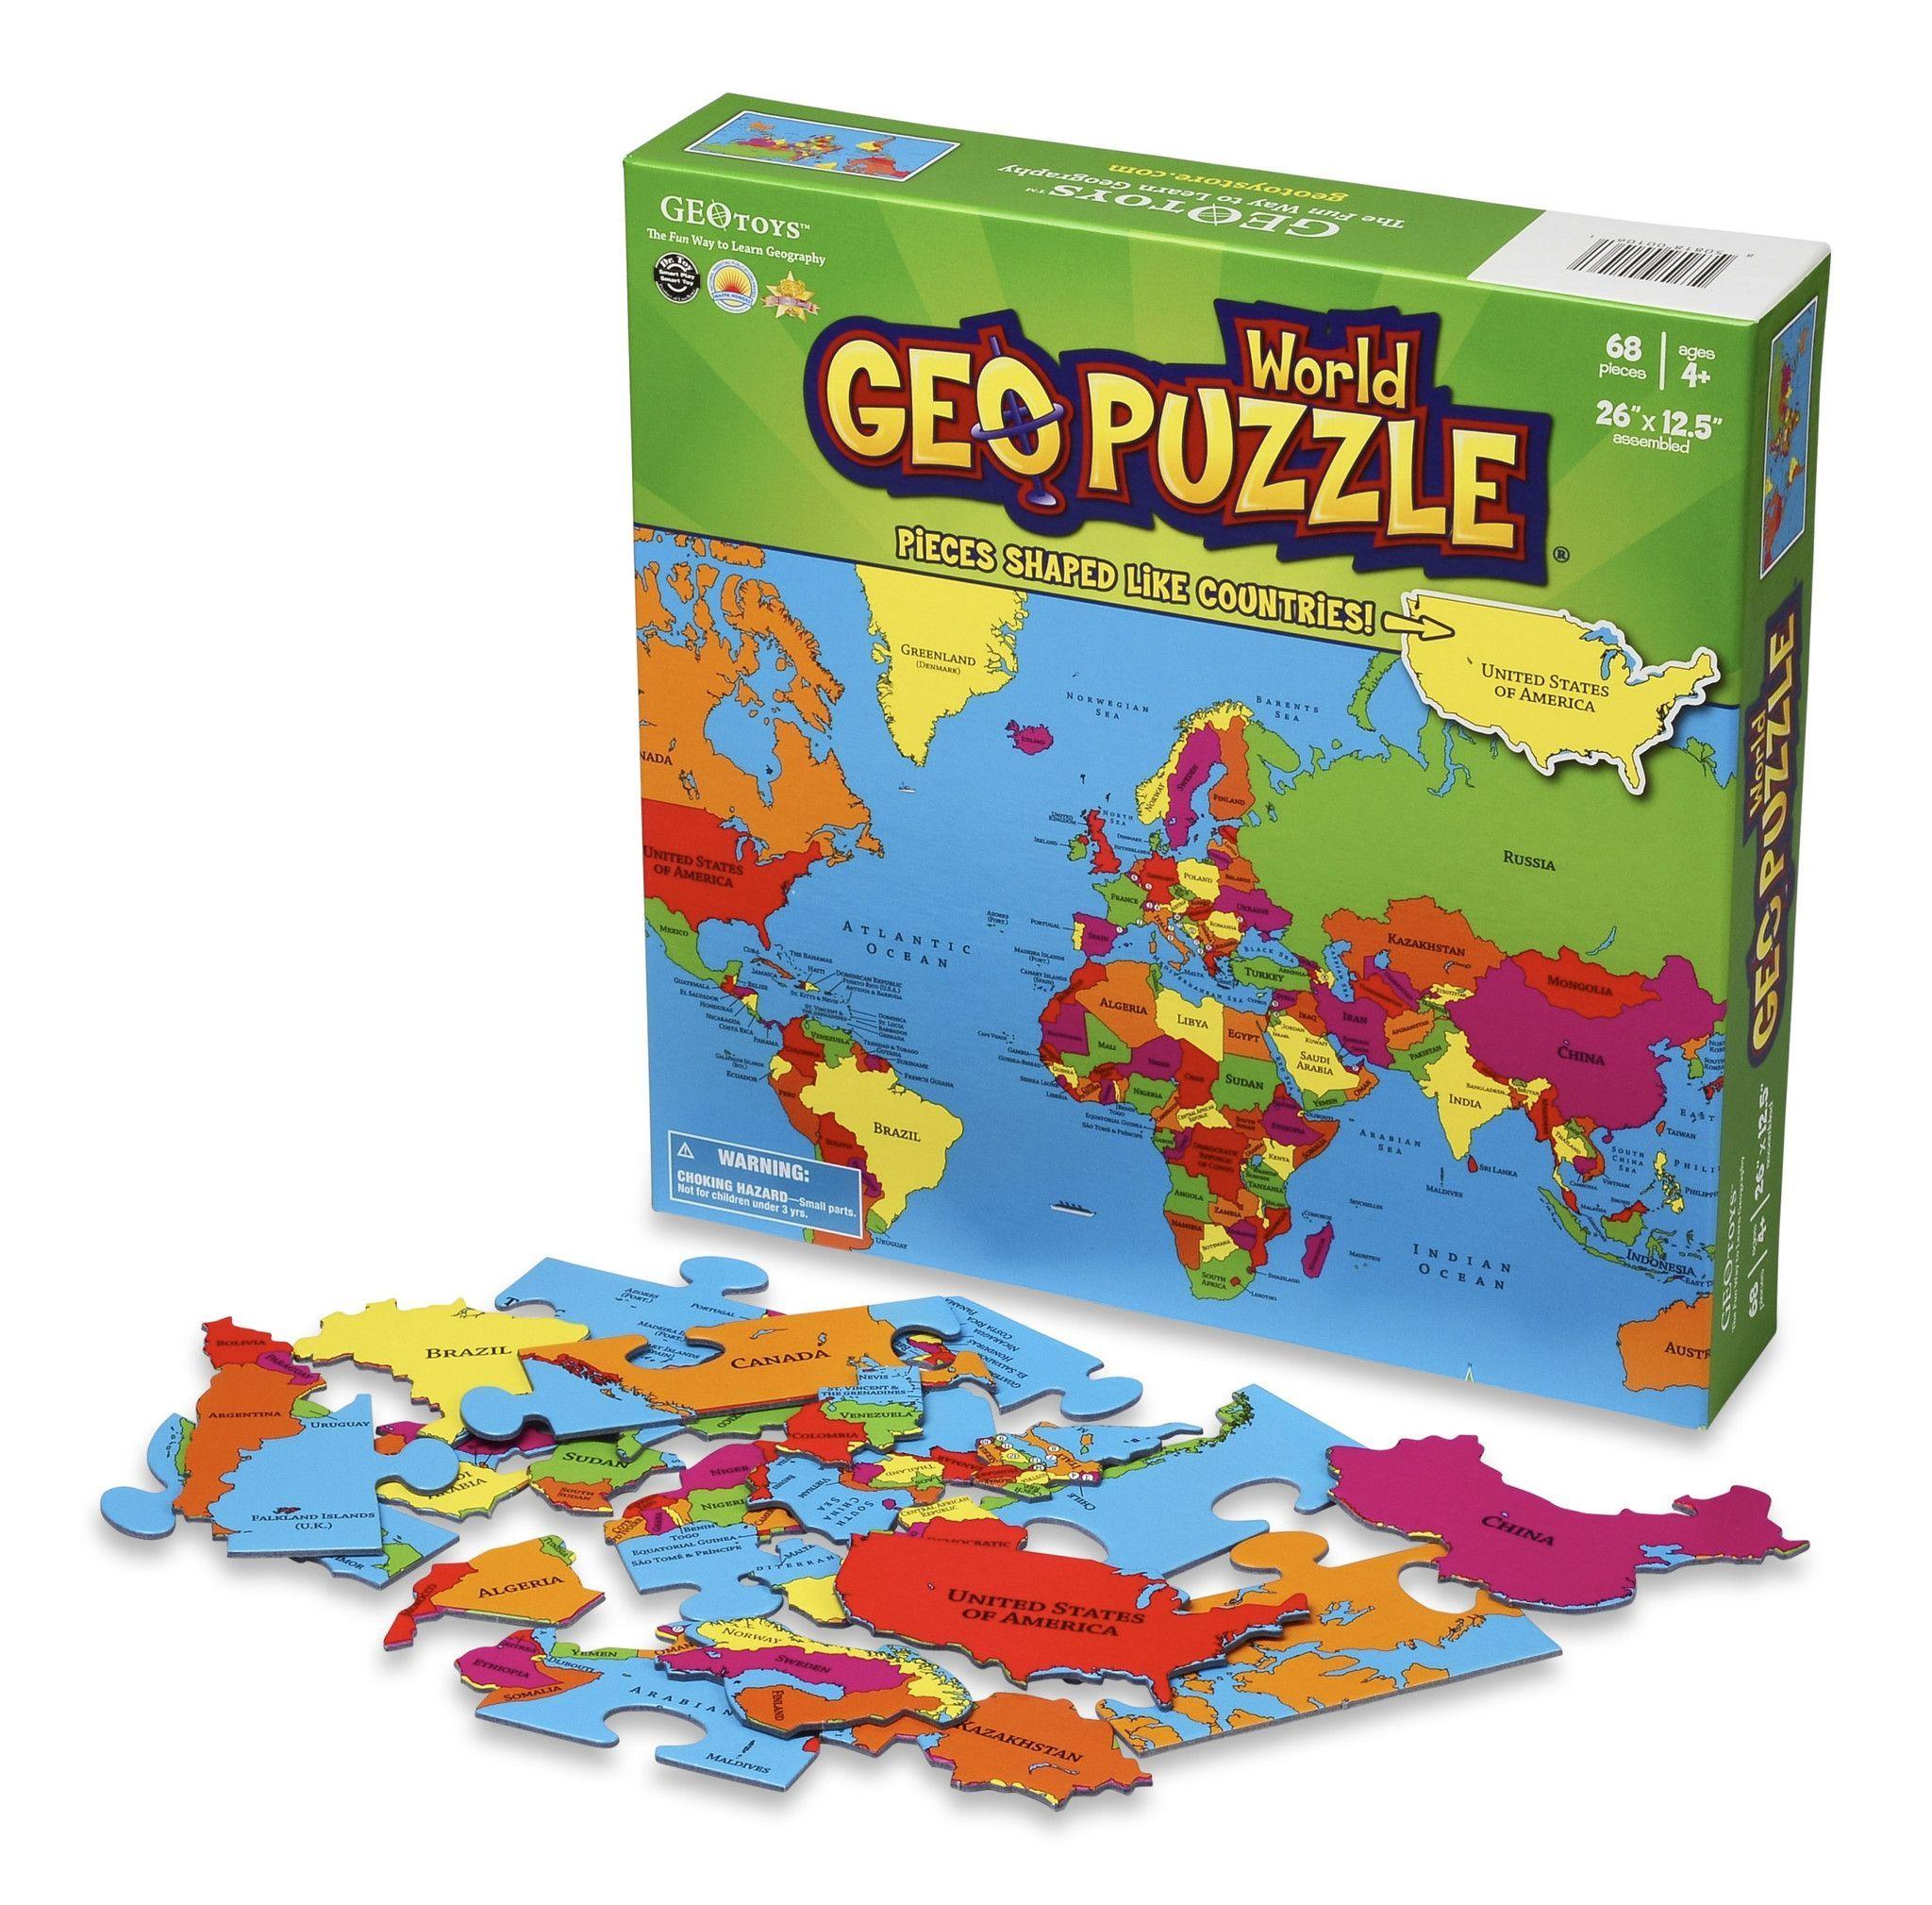 GeoToys GeoPuzzle World my kids love these on rainy days